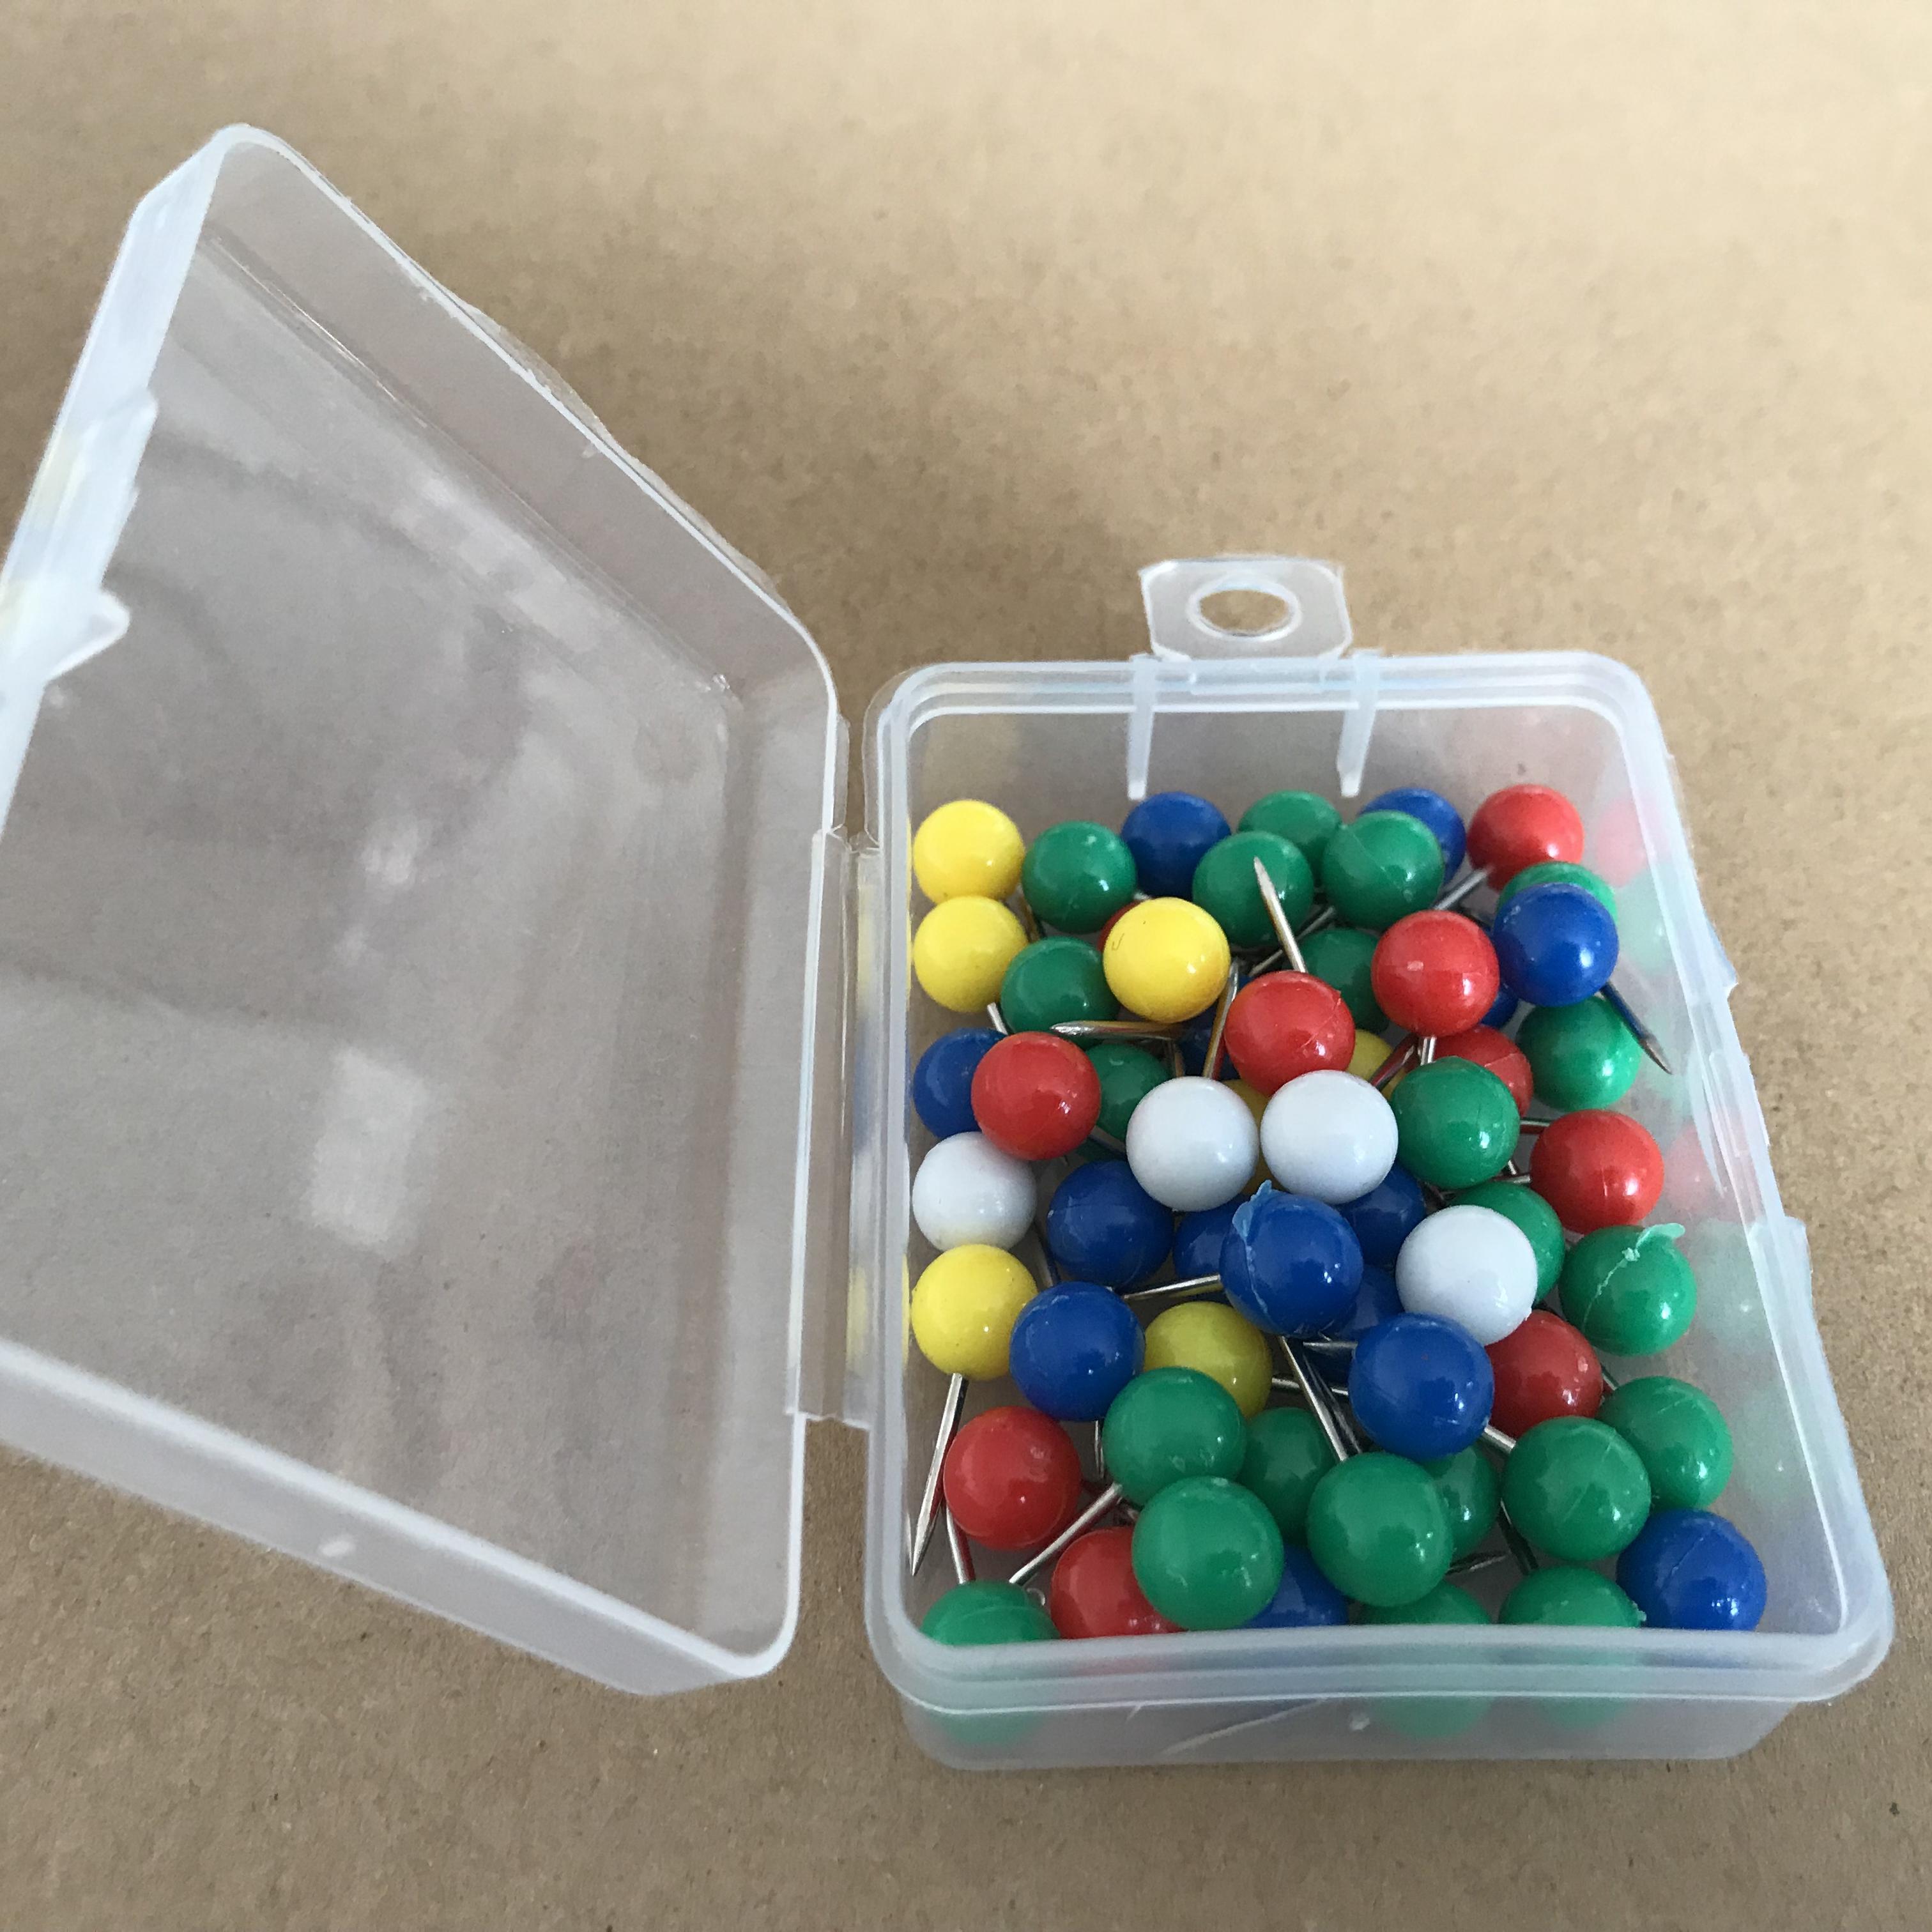 500pcs Push Pin Decorative Map Tacks Drawing Pin for Calendar Fabric Making Maps